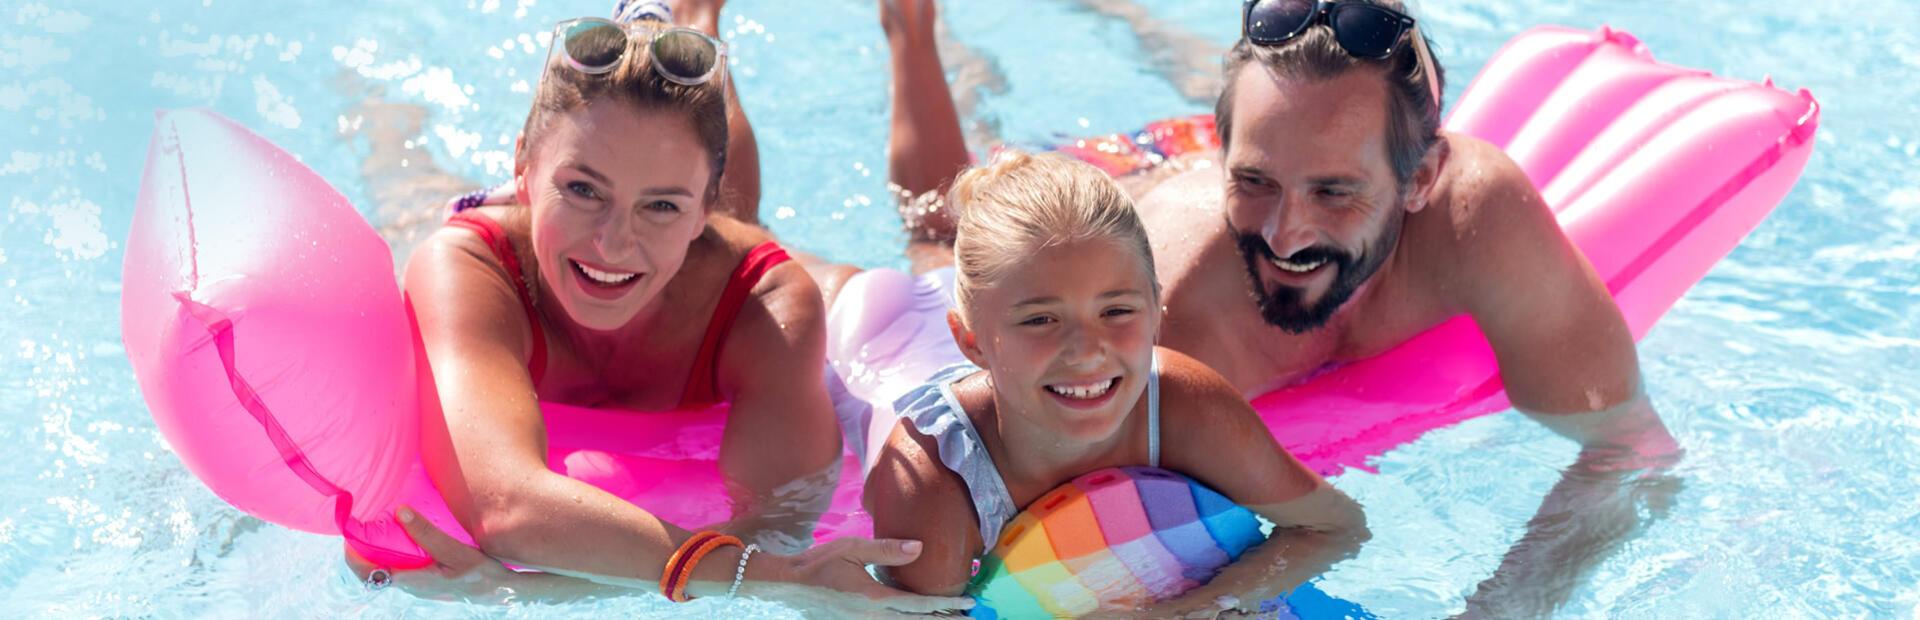 hotelgardencesenatico de hotel-cesenatico-mit-pool 004